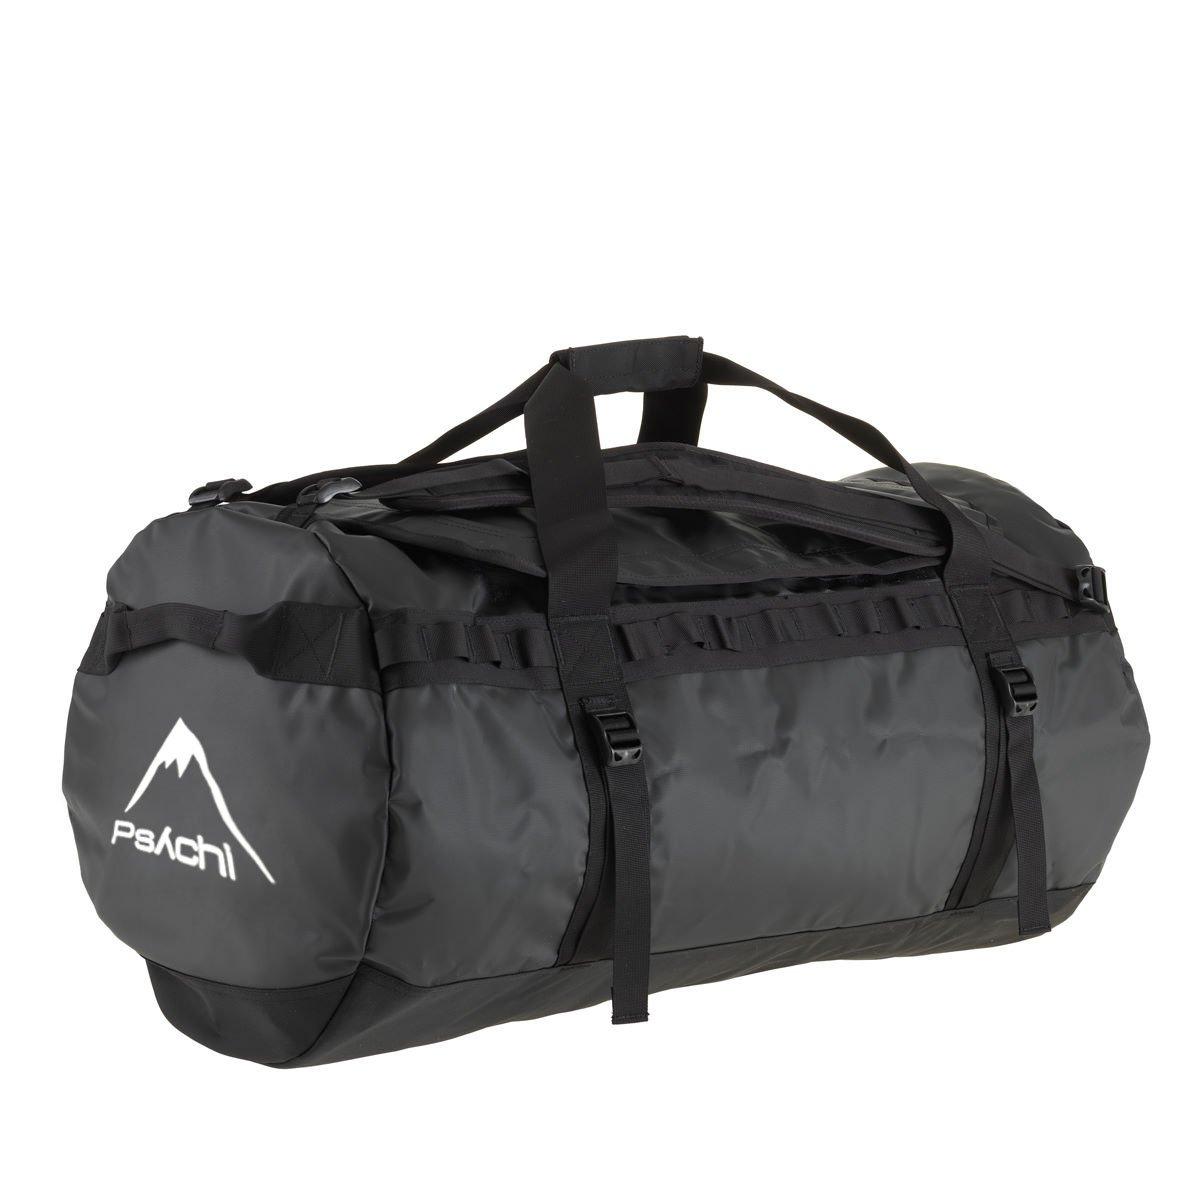 976c32a8d3df Karrimor Duffle Bag Sports Direct